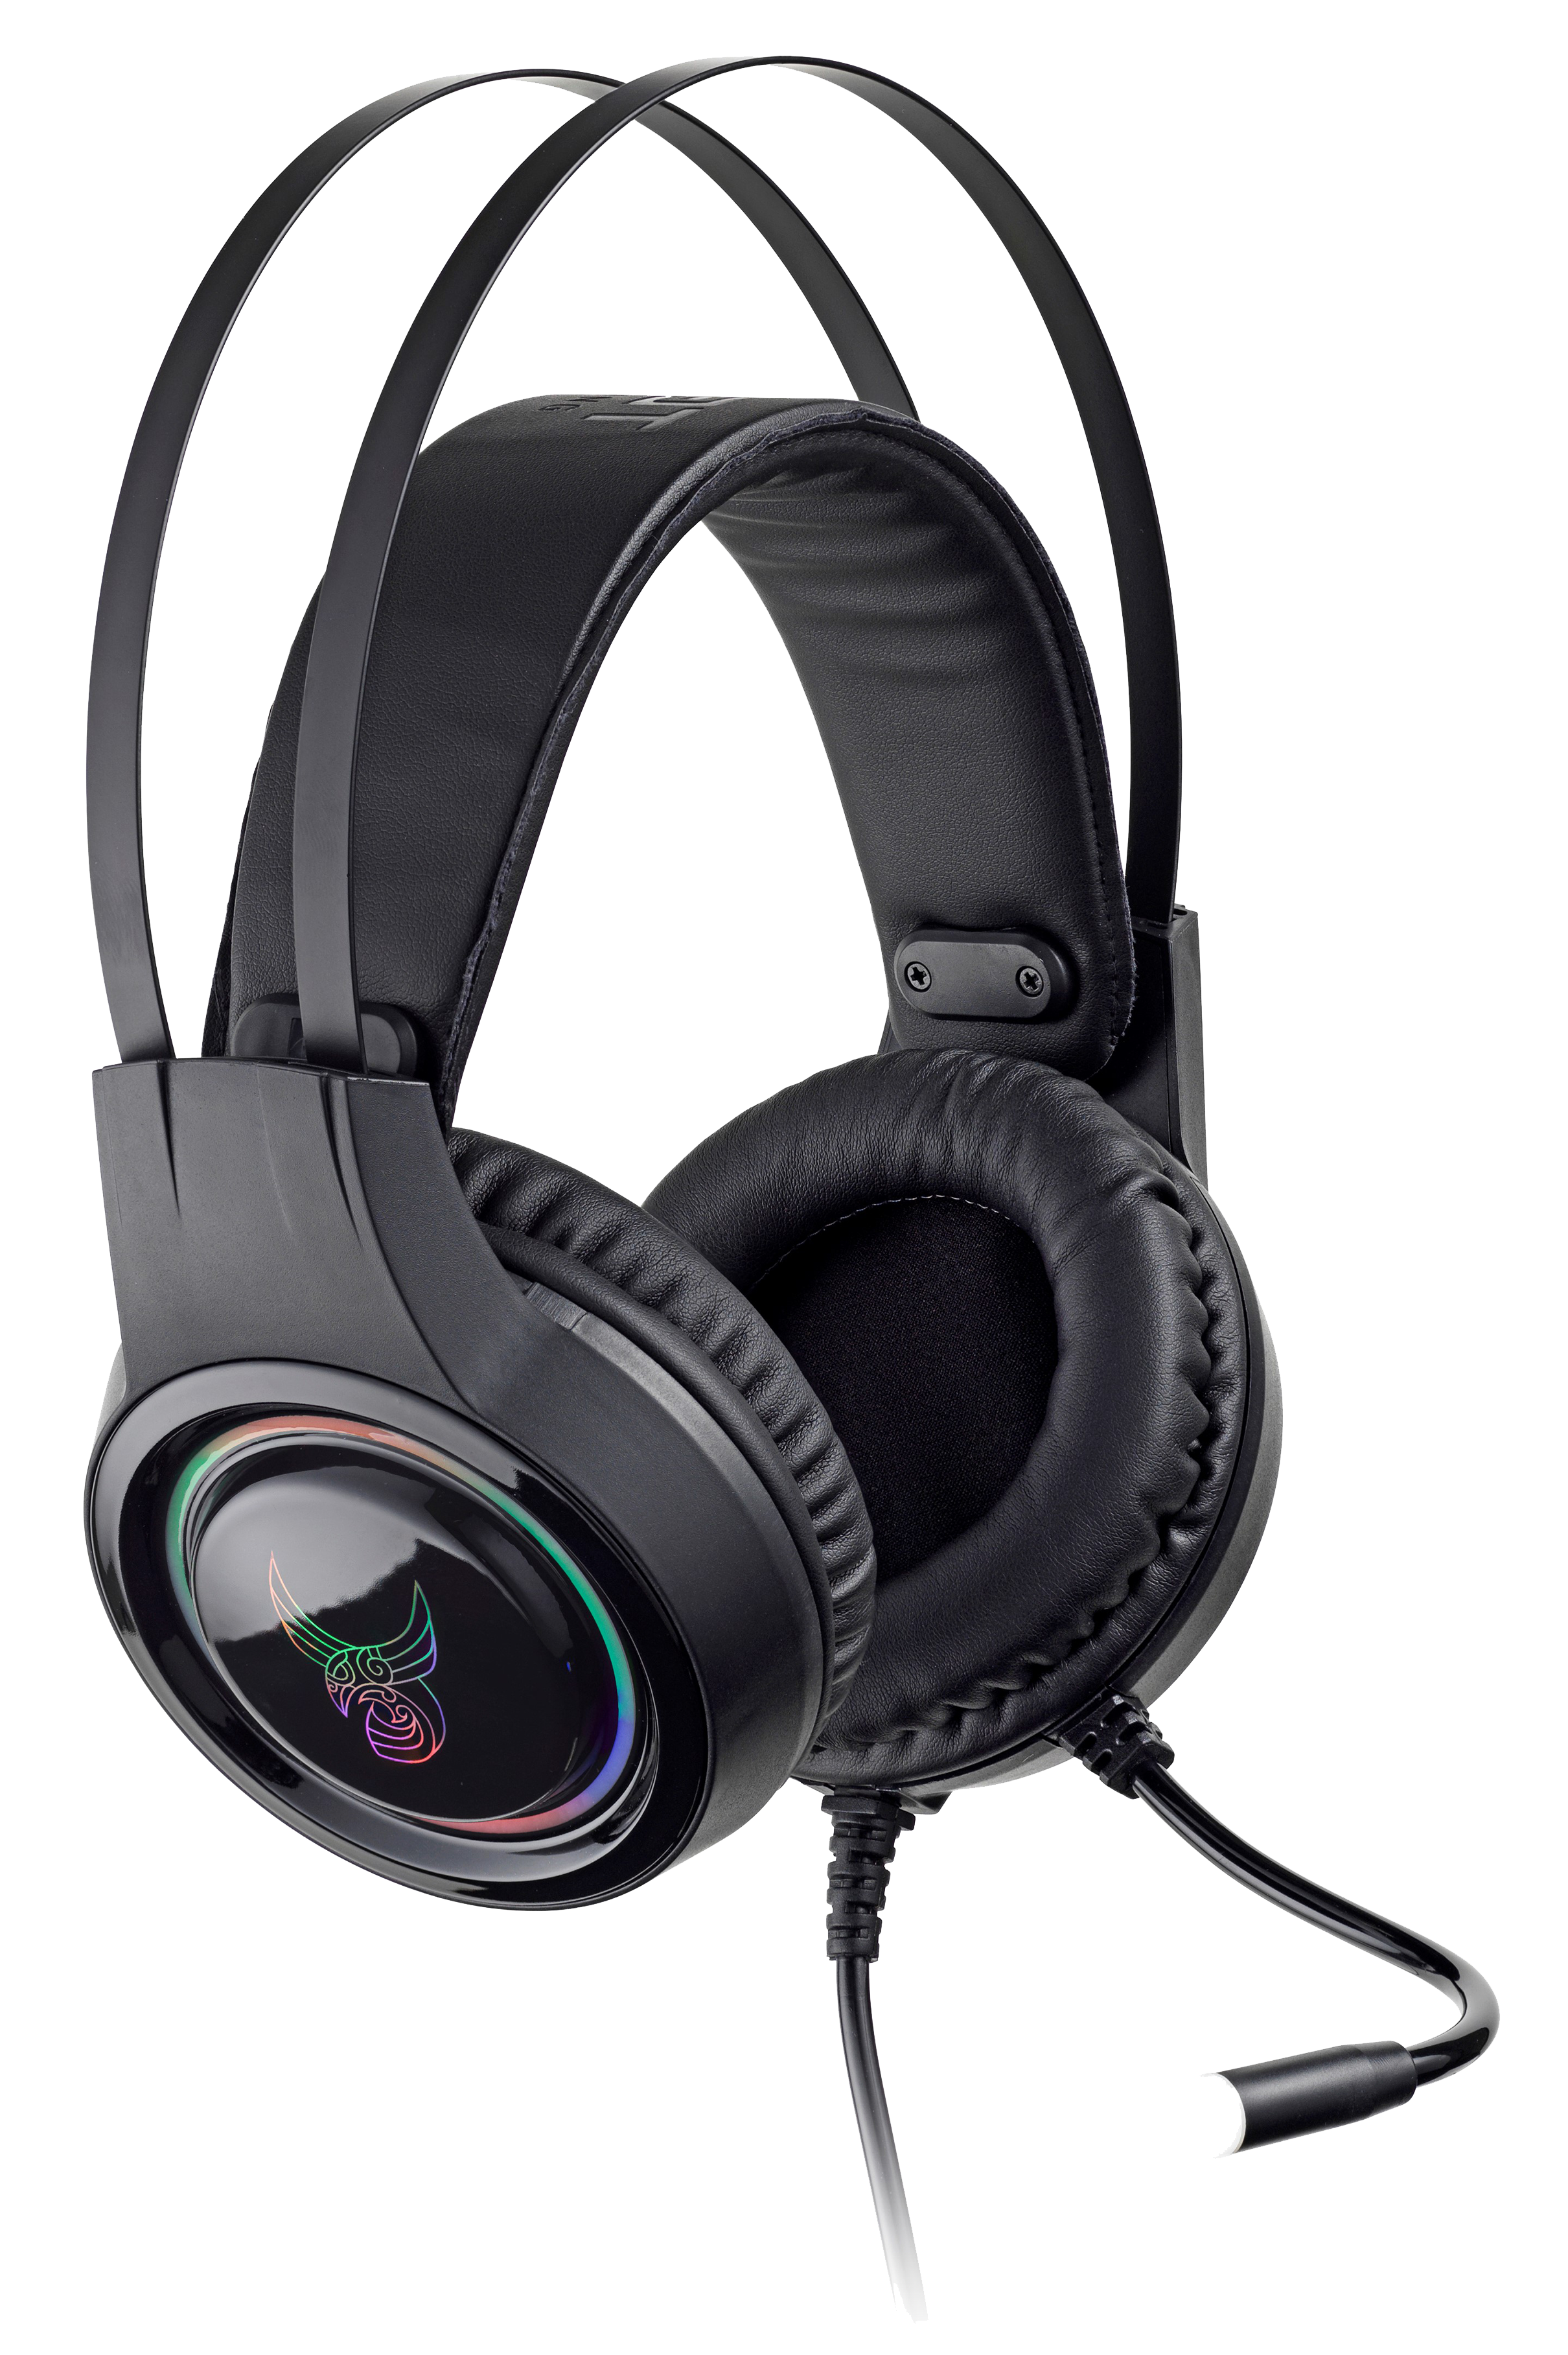 Gjallarhorn - headset